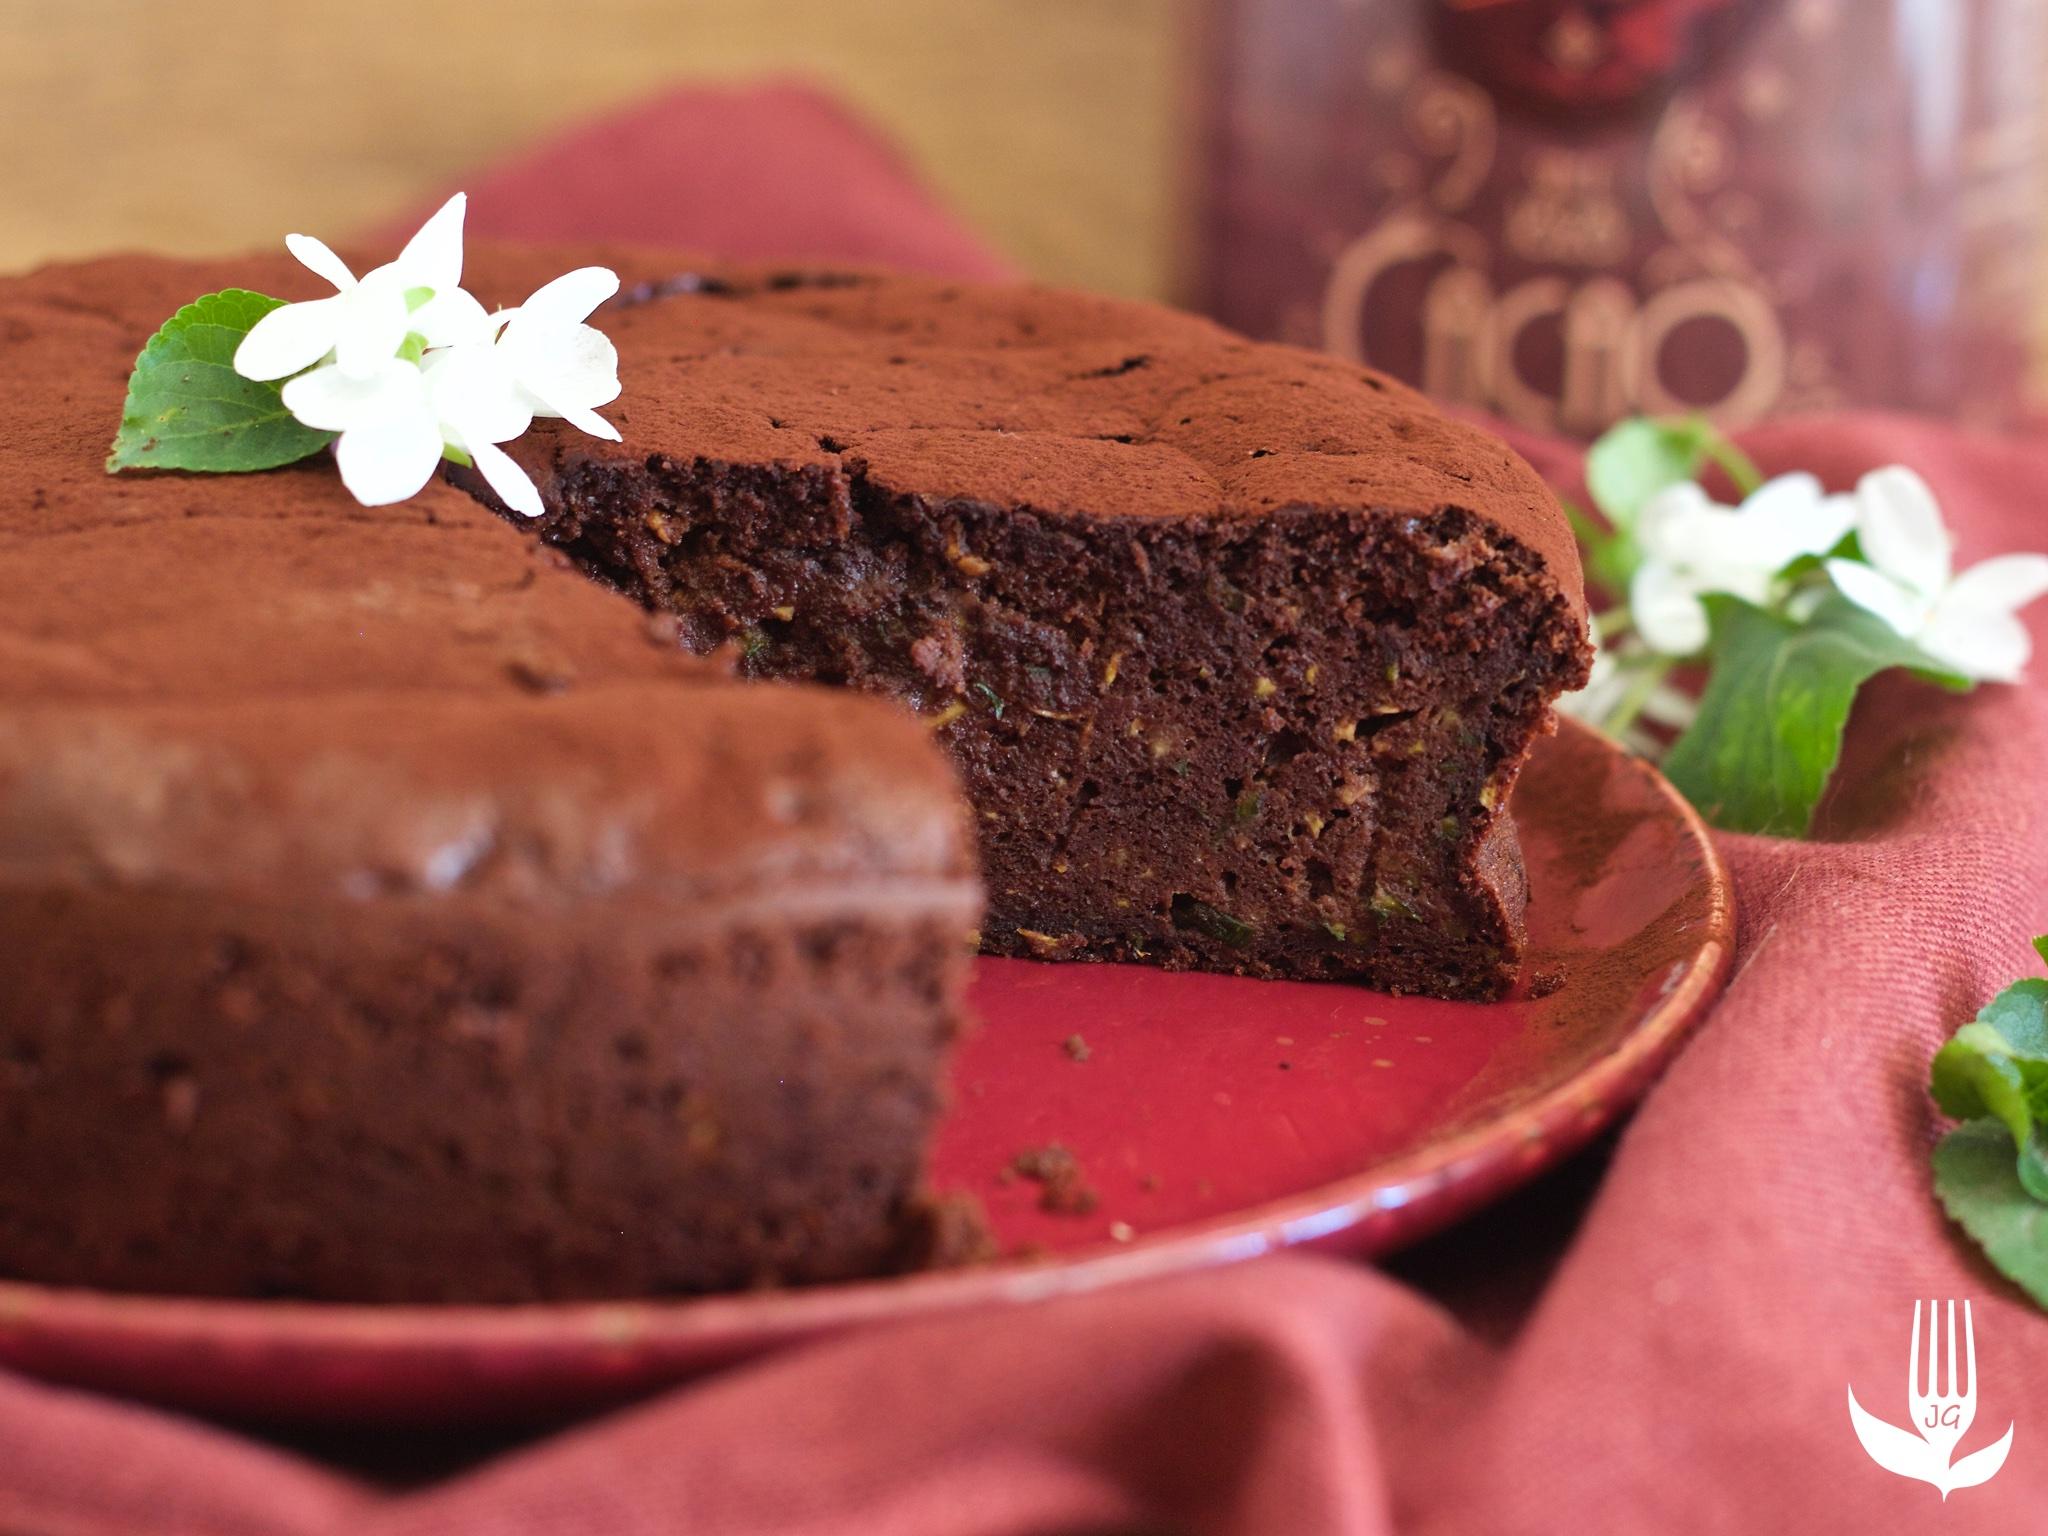 Moelleux-Chocolat-Courgette-JDG9